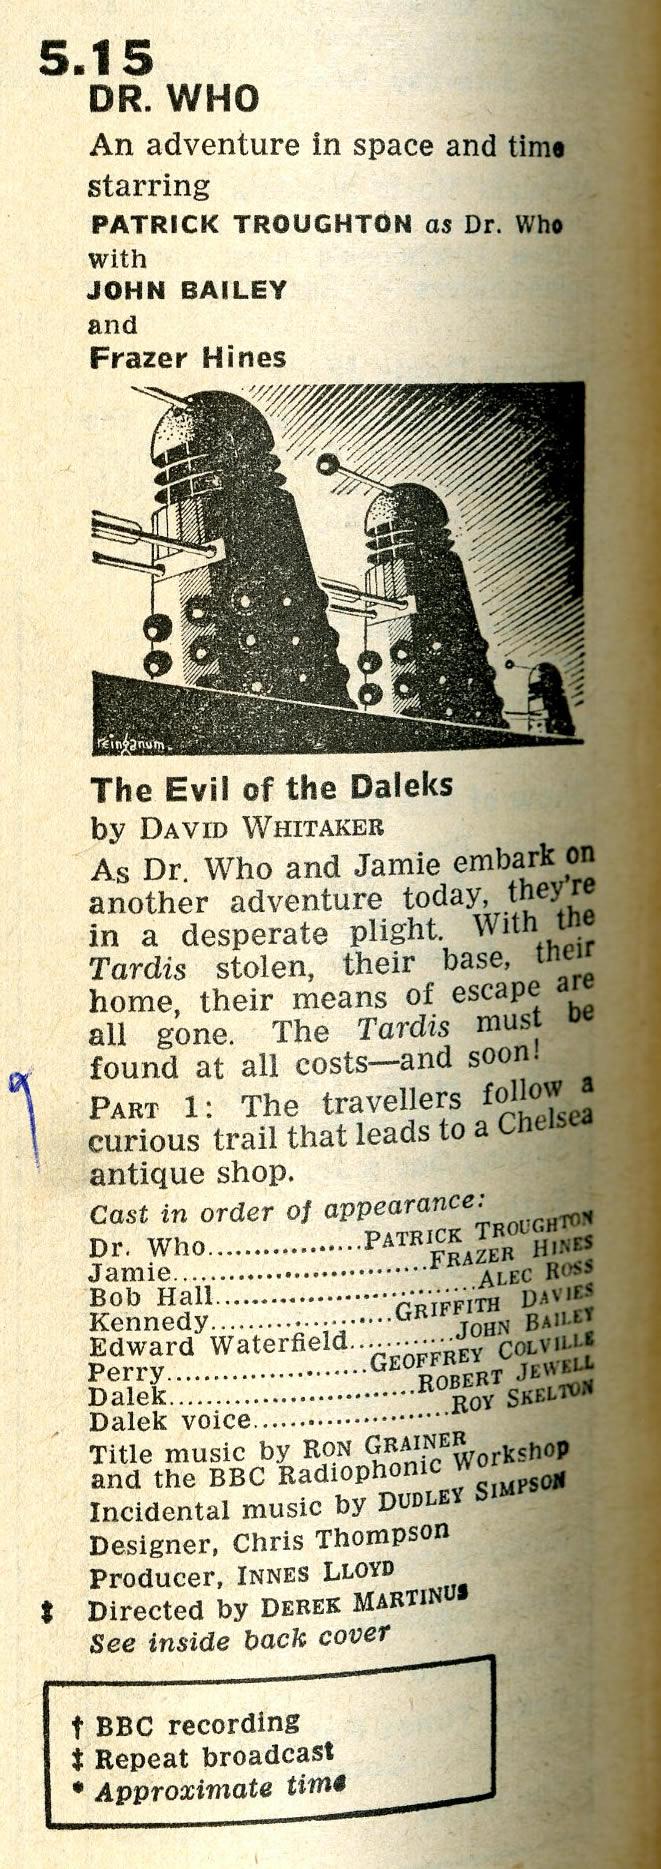 Radio Times, 8-14 June 1968